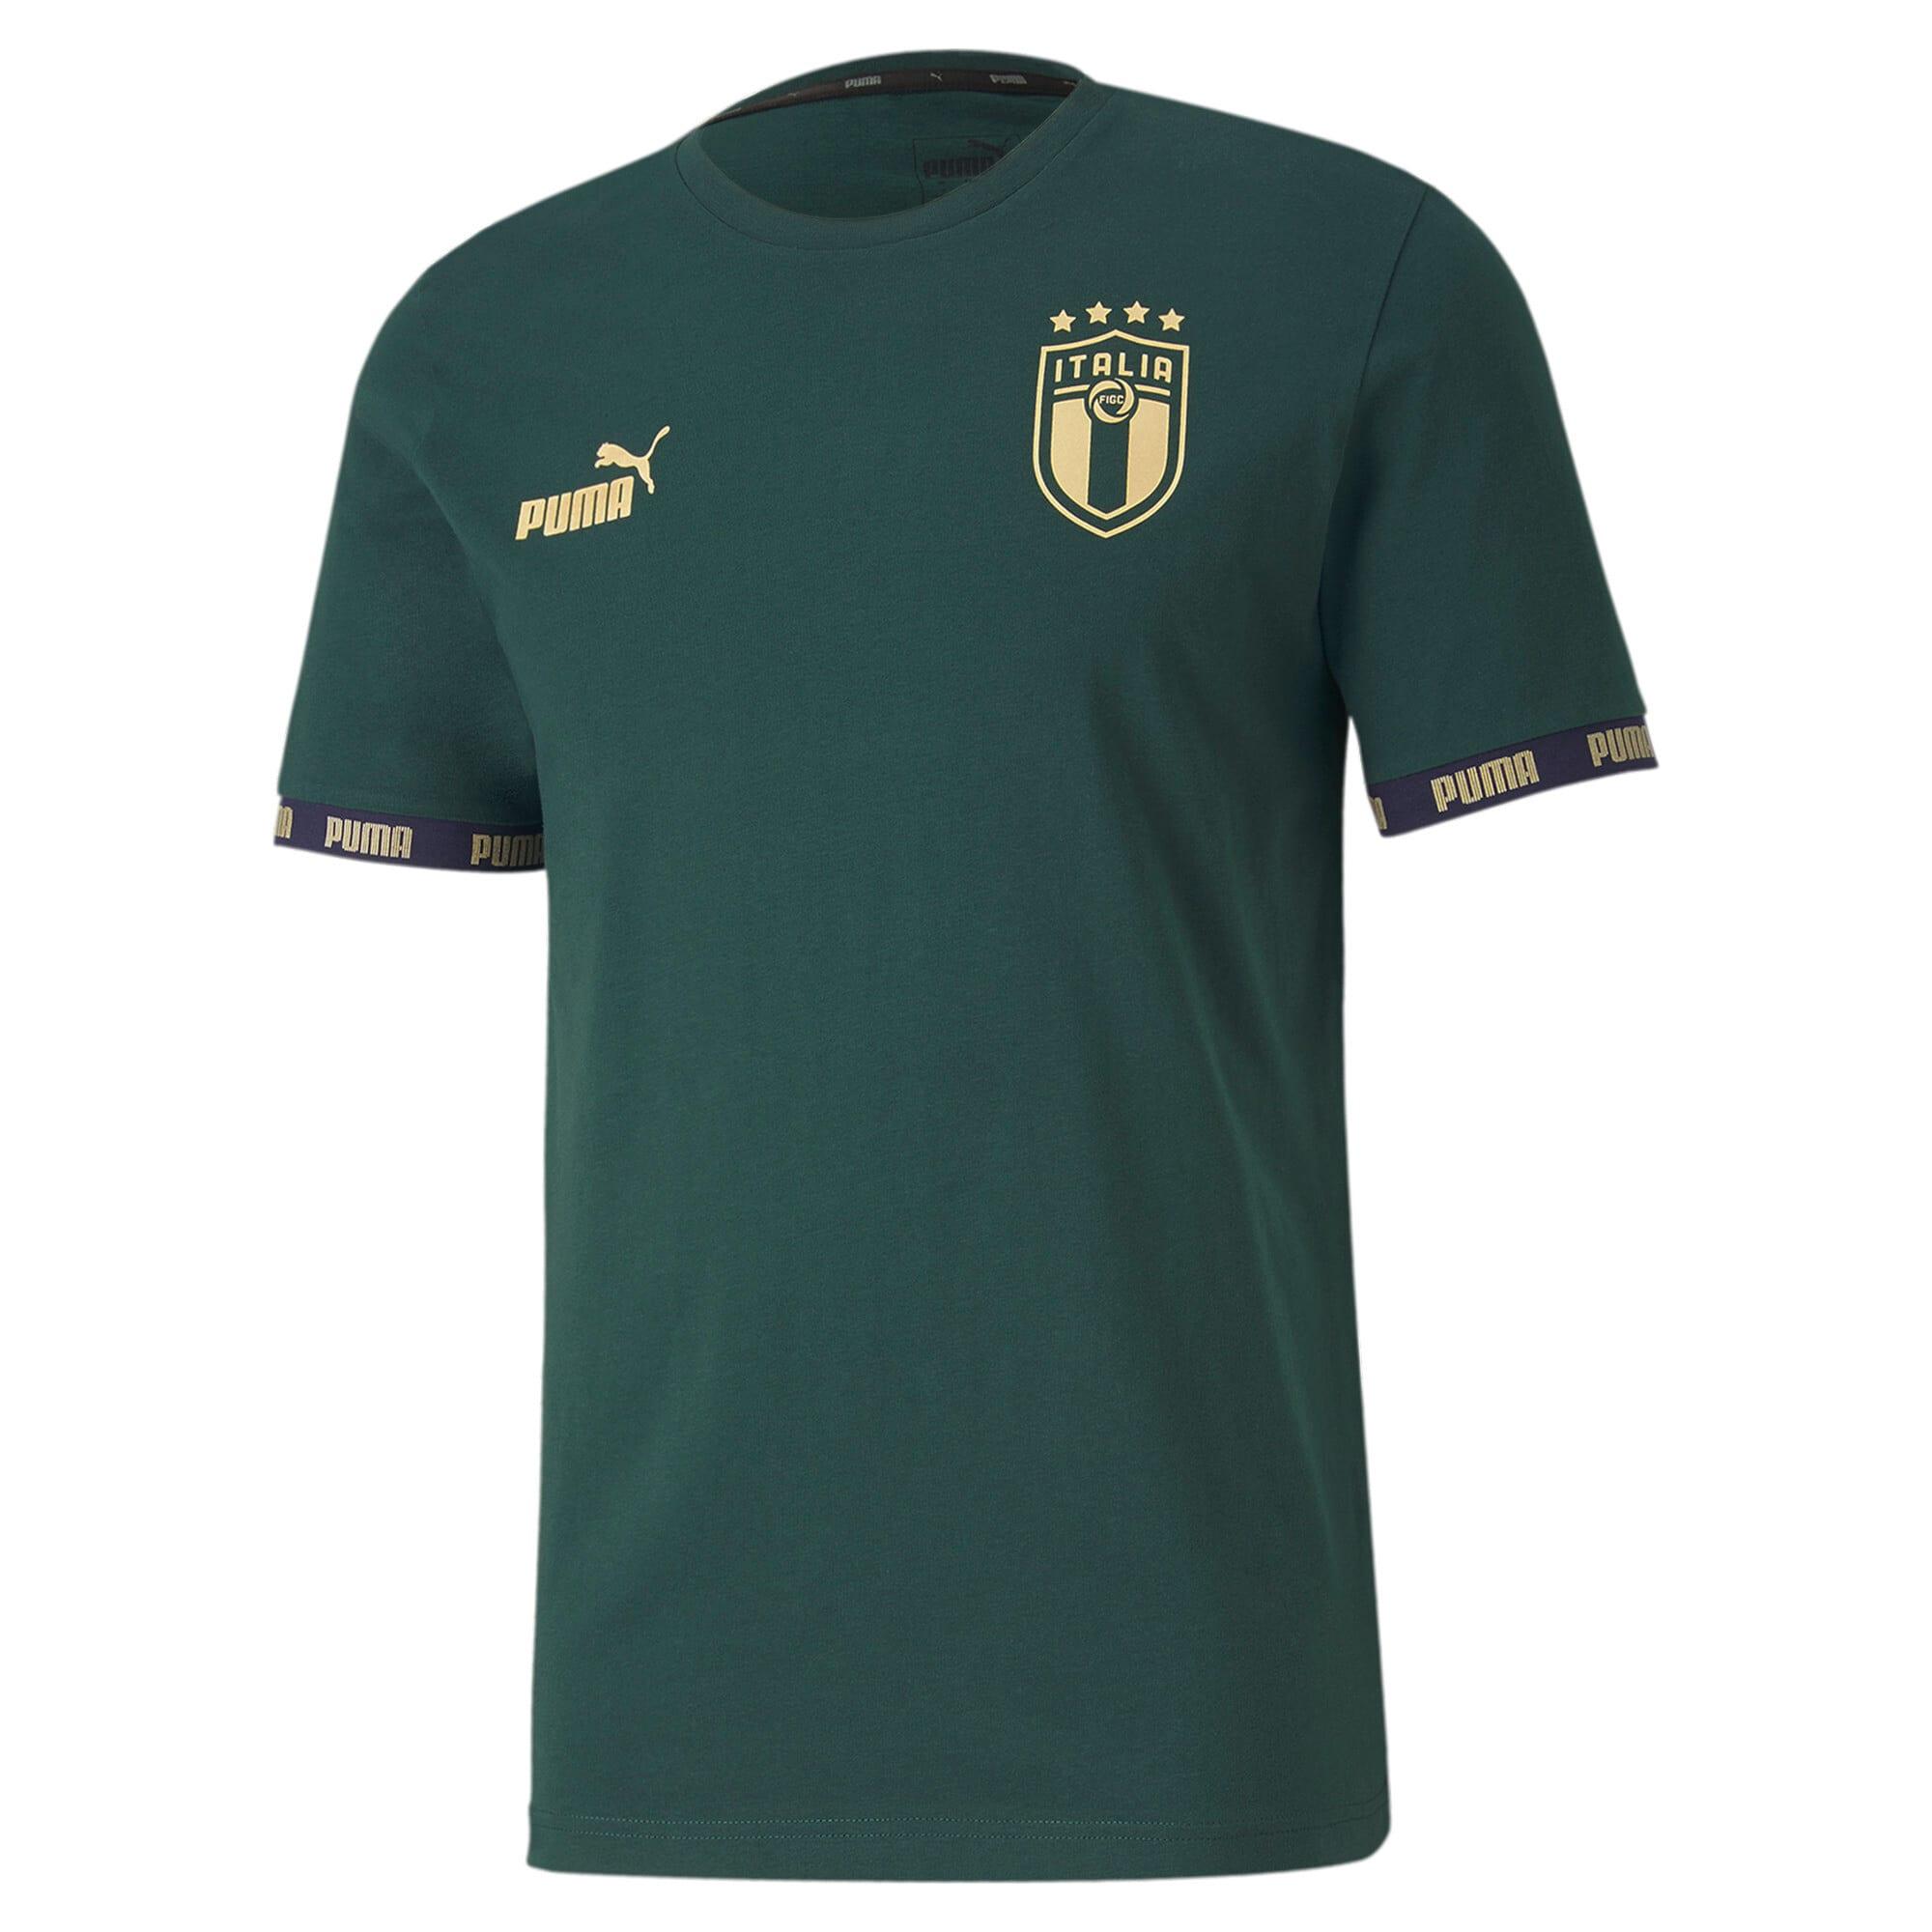 Thumbnail 1 of FIGC イタリア FTBL CULTURE Tシャツ 半袖, Ponderosa Pine, medium-JPN